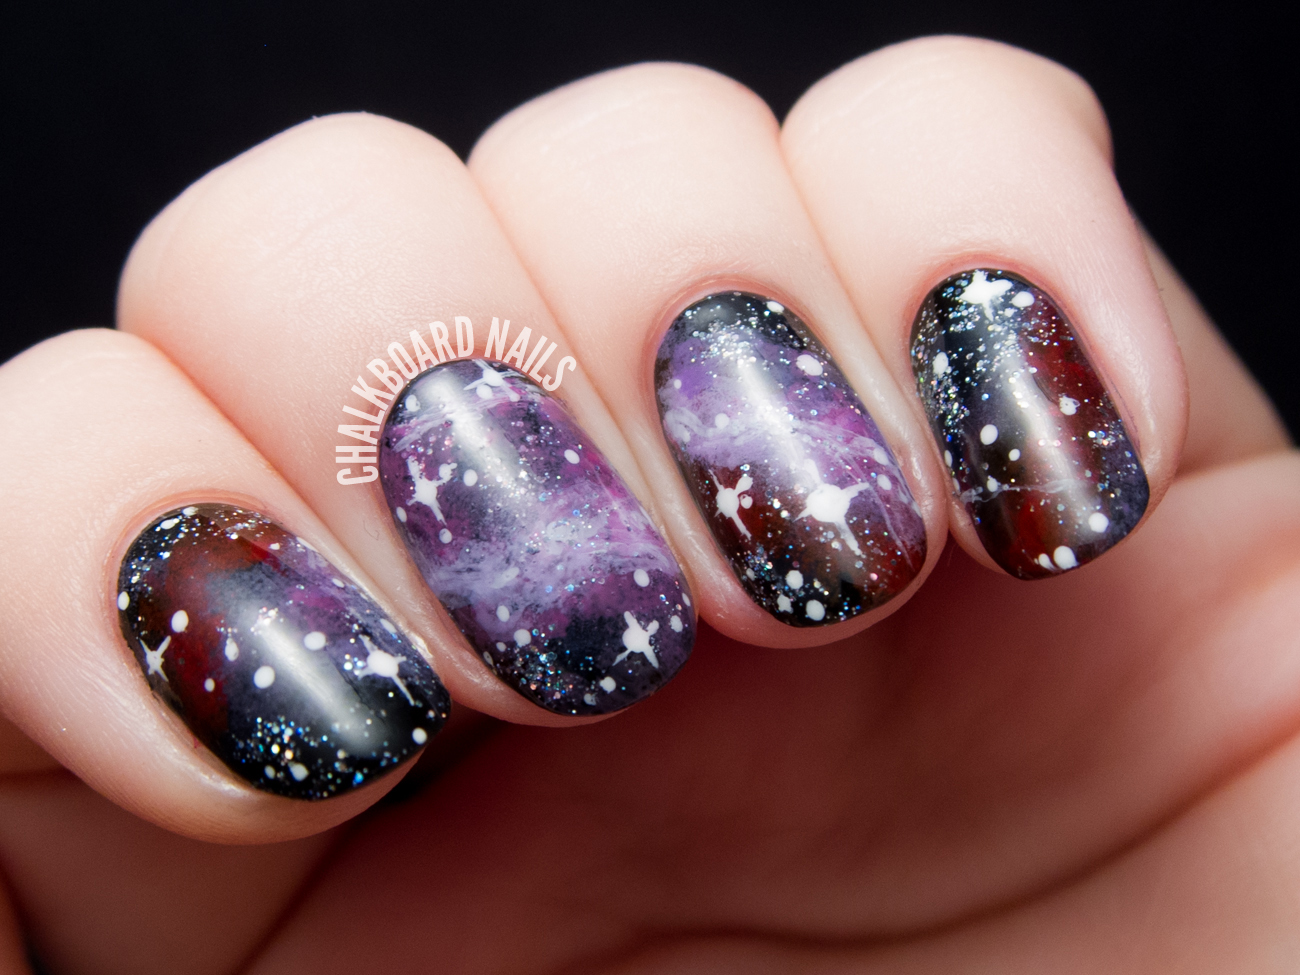 Purple galaxy nail art by @chalkboardnails